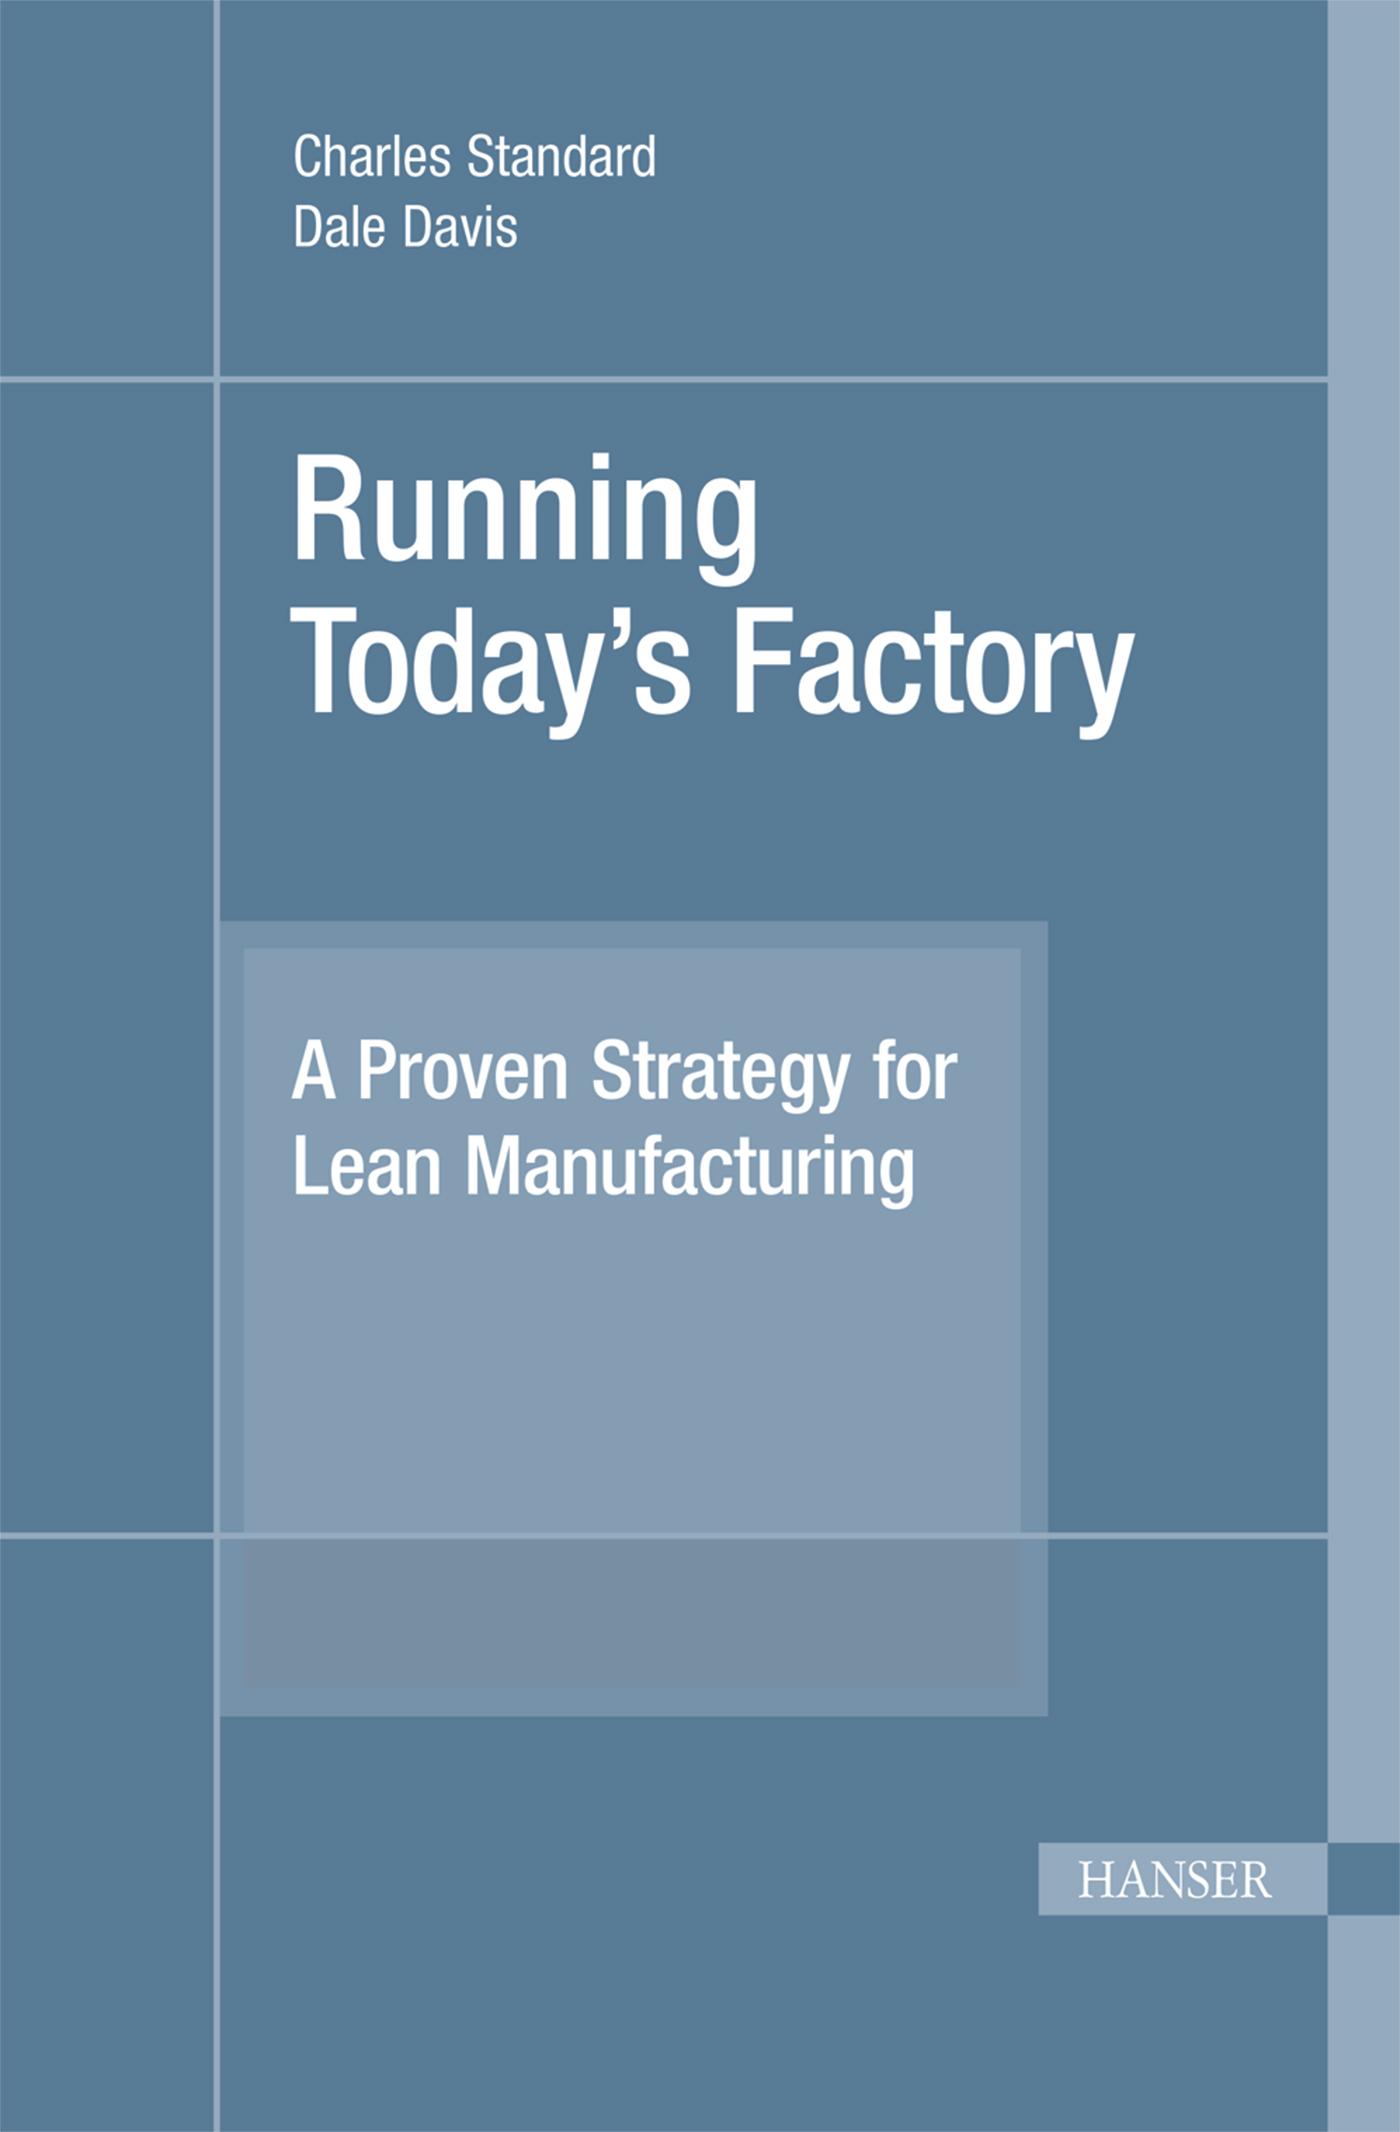 Standard, Davis, Running Today's Factory, 978-3-446-41974-2